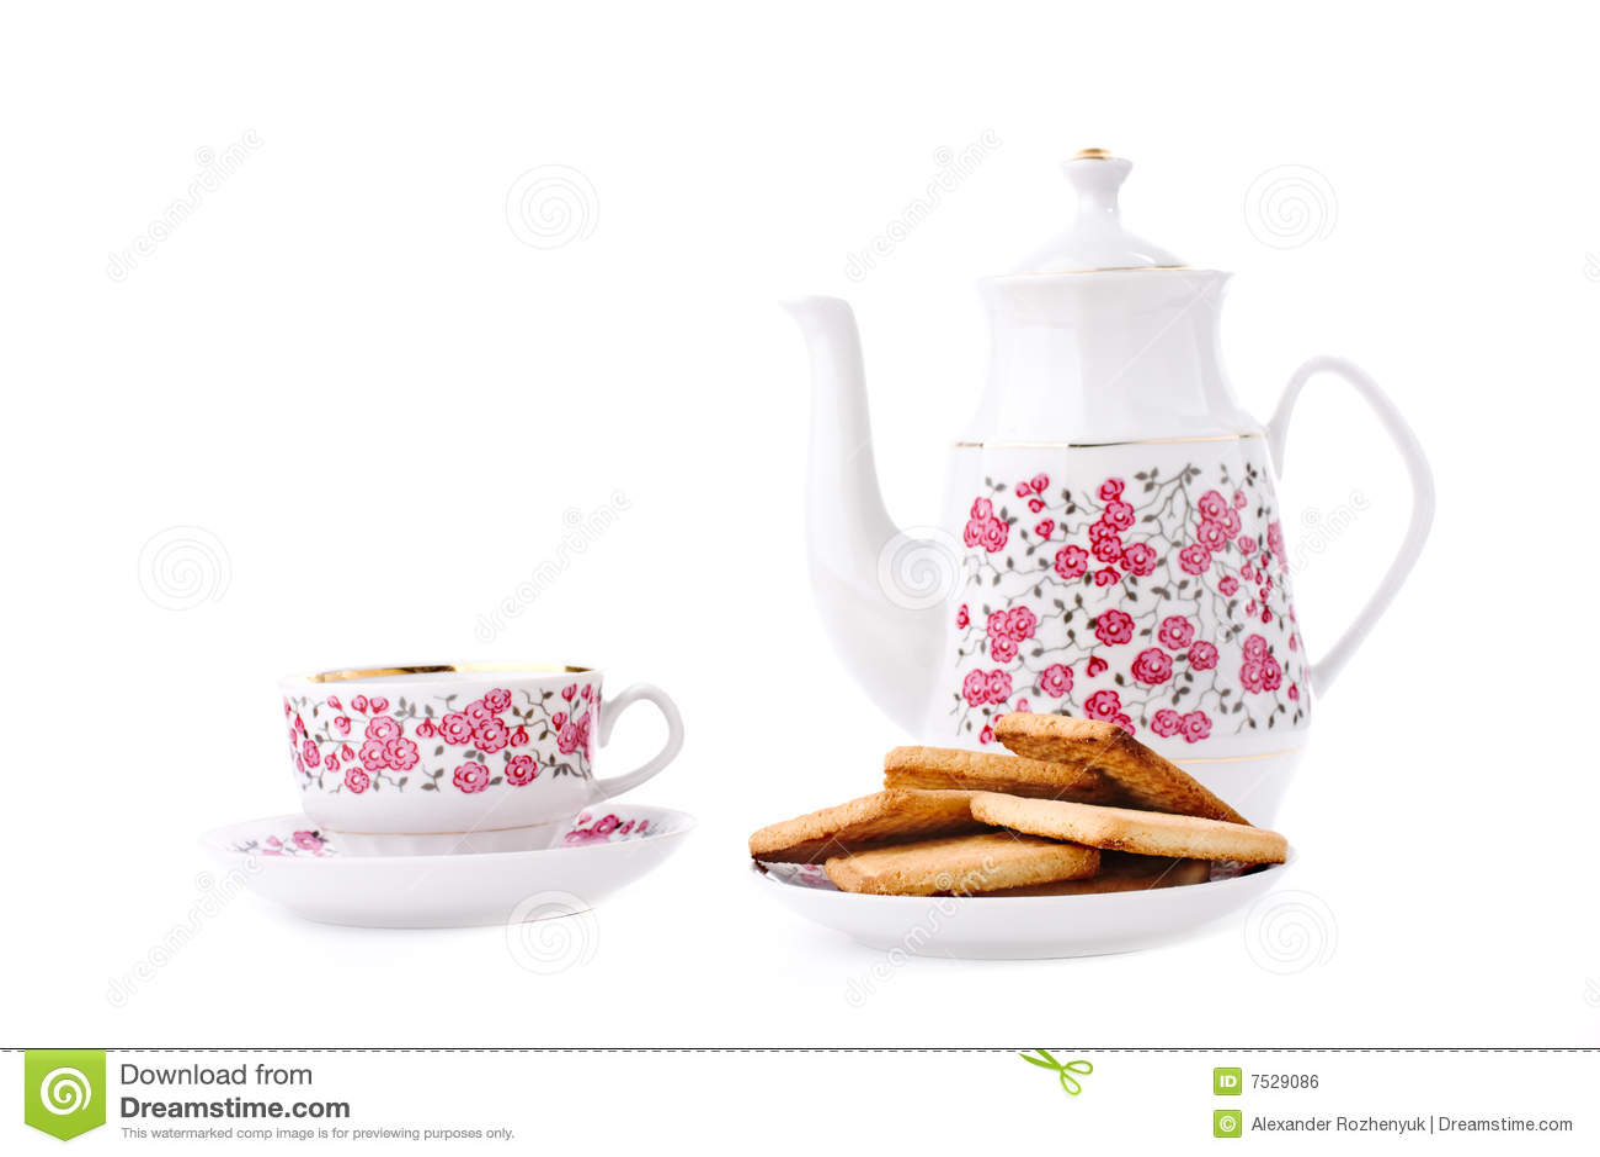 Elegant porcelain tea set